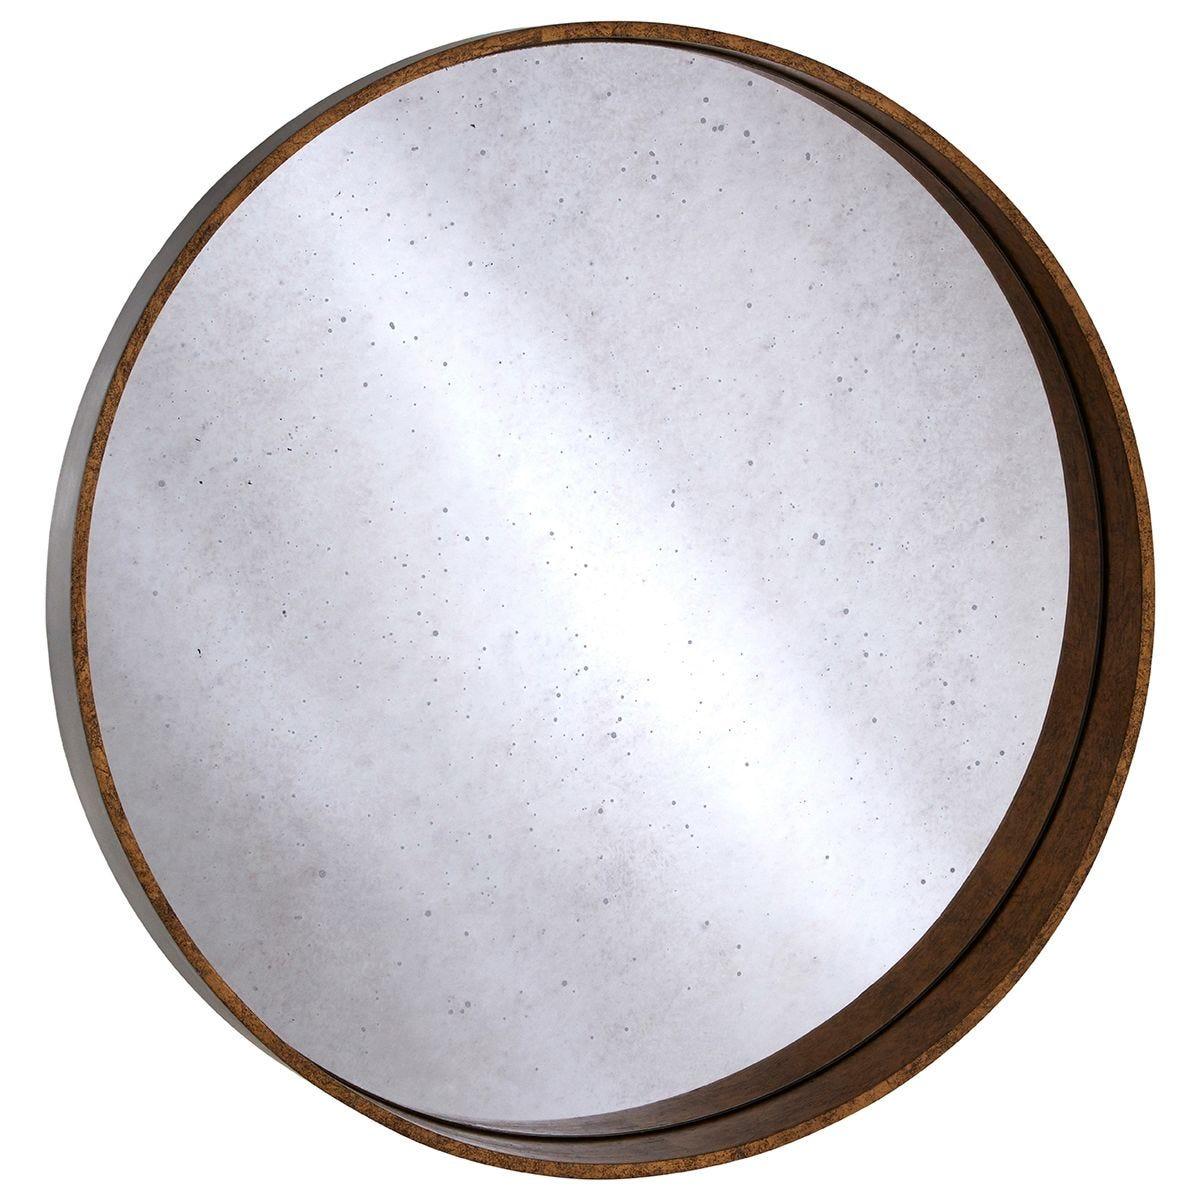 Premier Housewares Colton Round Wall Mirror - Antique Gold Finish